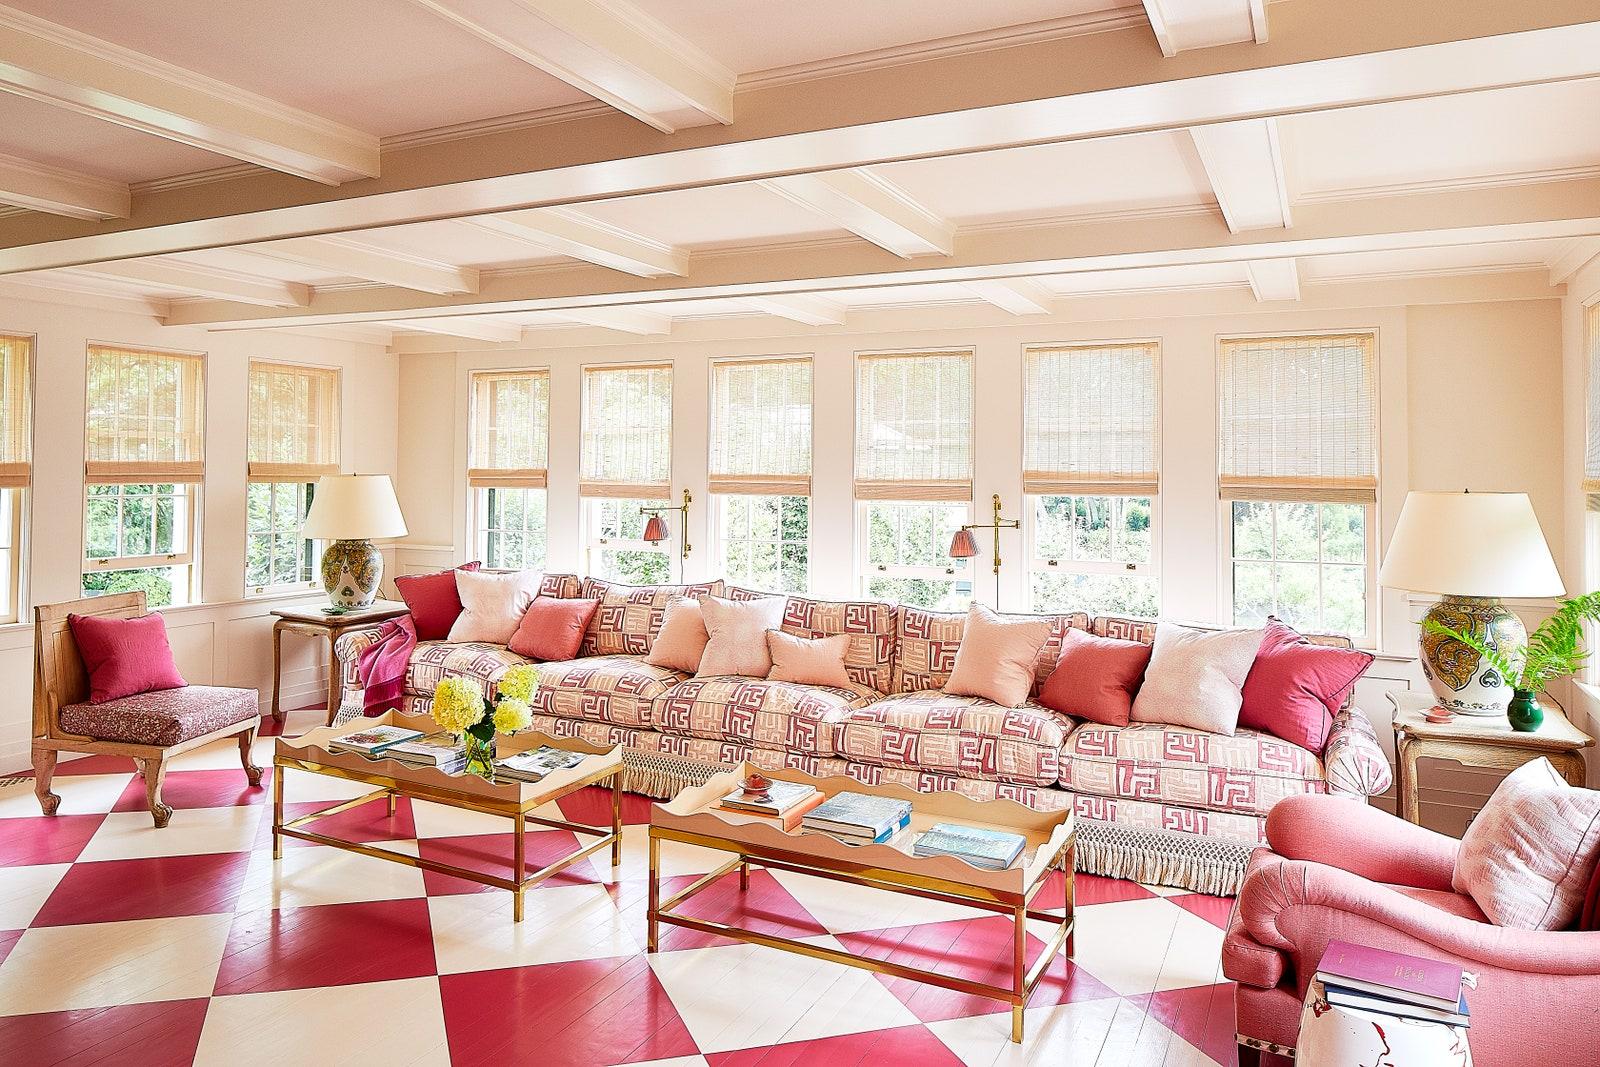 Katherine Rheinstein Brodsky Hamptons Home Crayola Chic Forever Chic by Meg